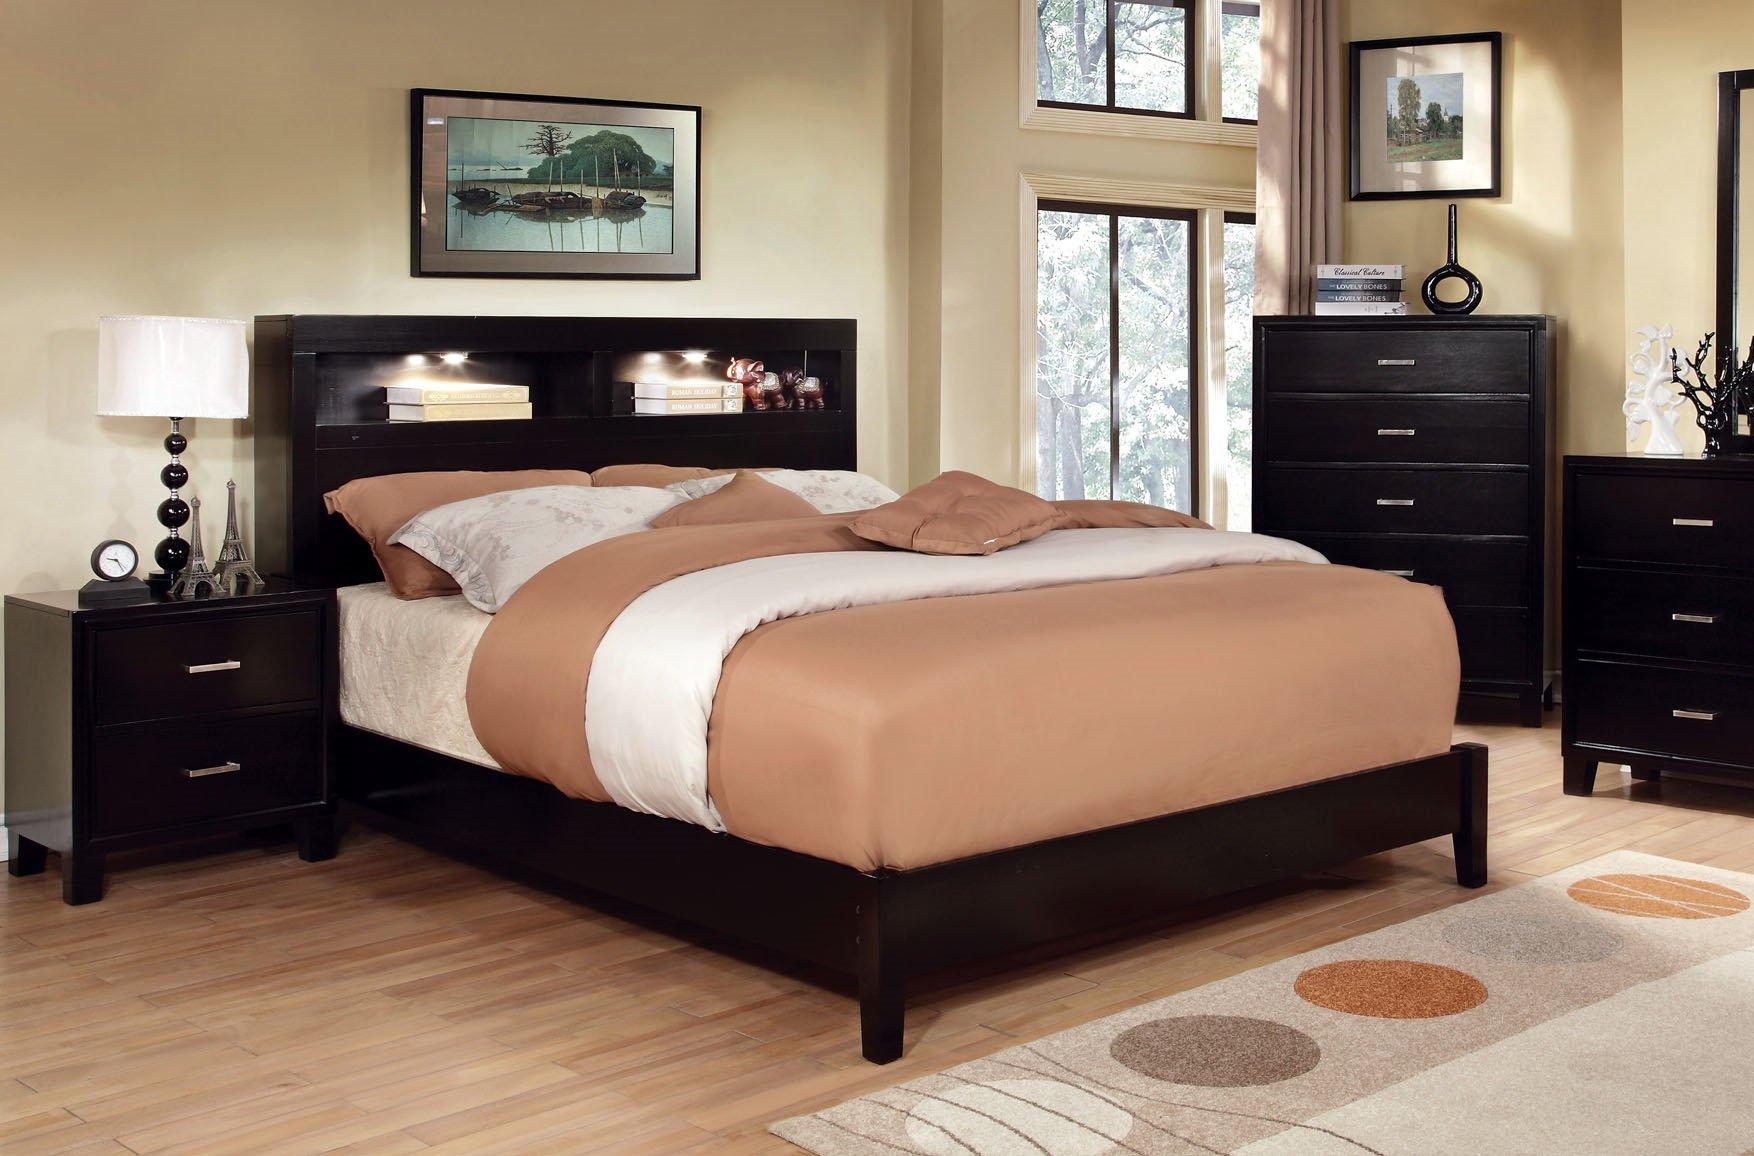 Furniture of America Metro Platform Bed with Bookcase Headboard and Light Design, California King, Espresso